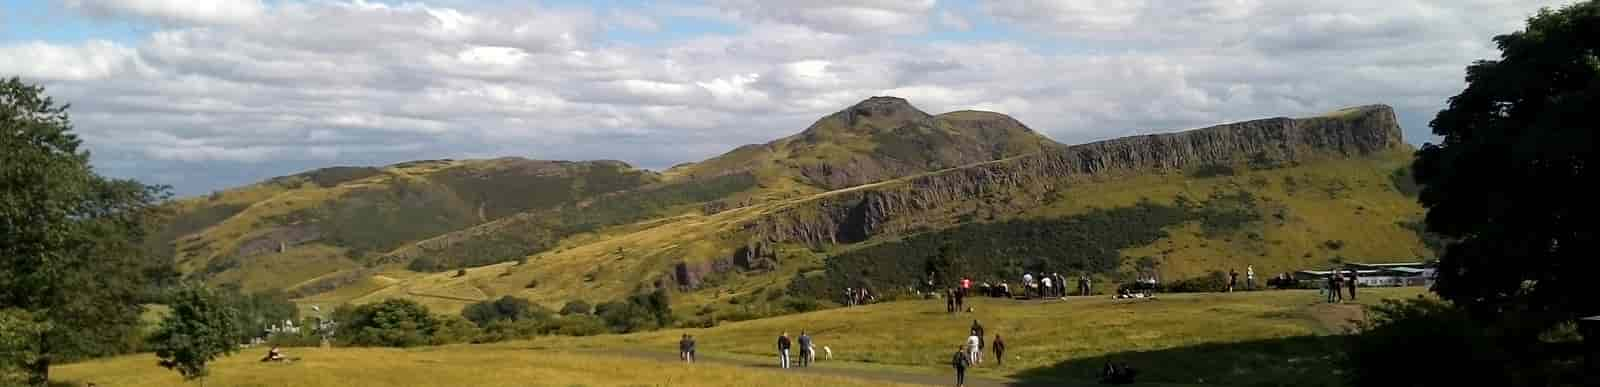 Edinburgh, Scotland - Arthur's Seat